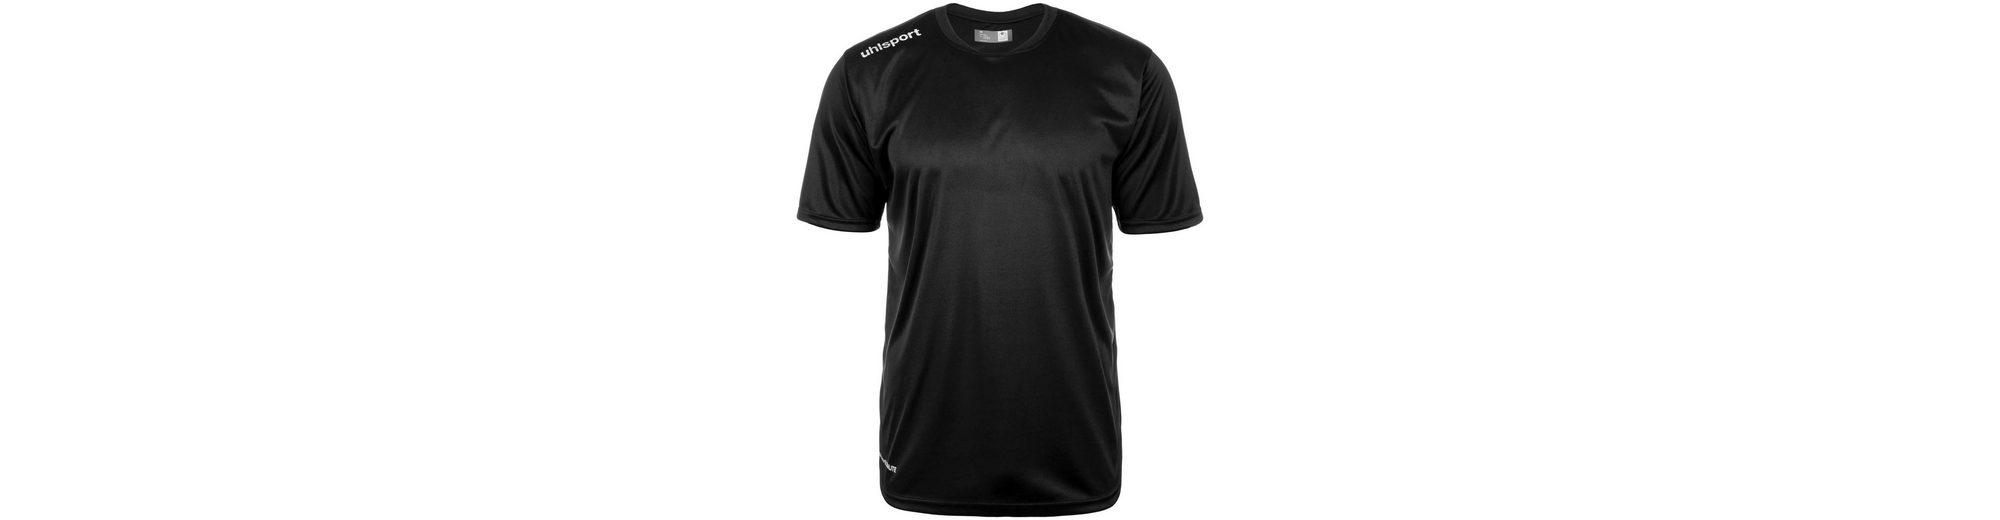 UHLSPORT Essential Polyester Training T-Shirt Herren Verkauf Billig Rabatt-Spielraum Store Auslass Eastbay wHN1tEw0RQ